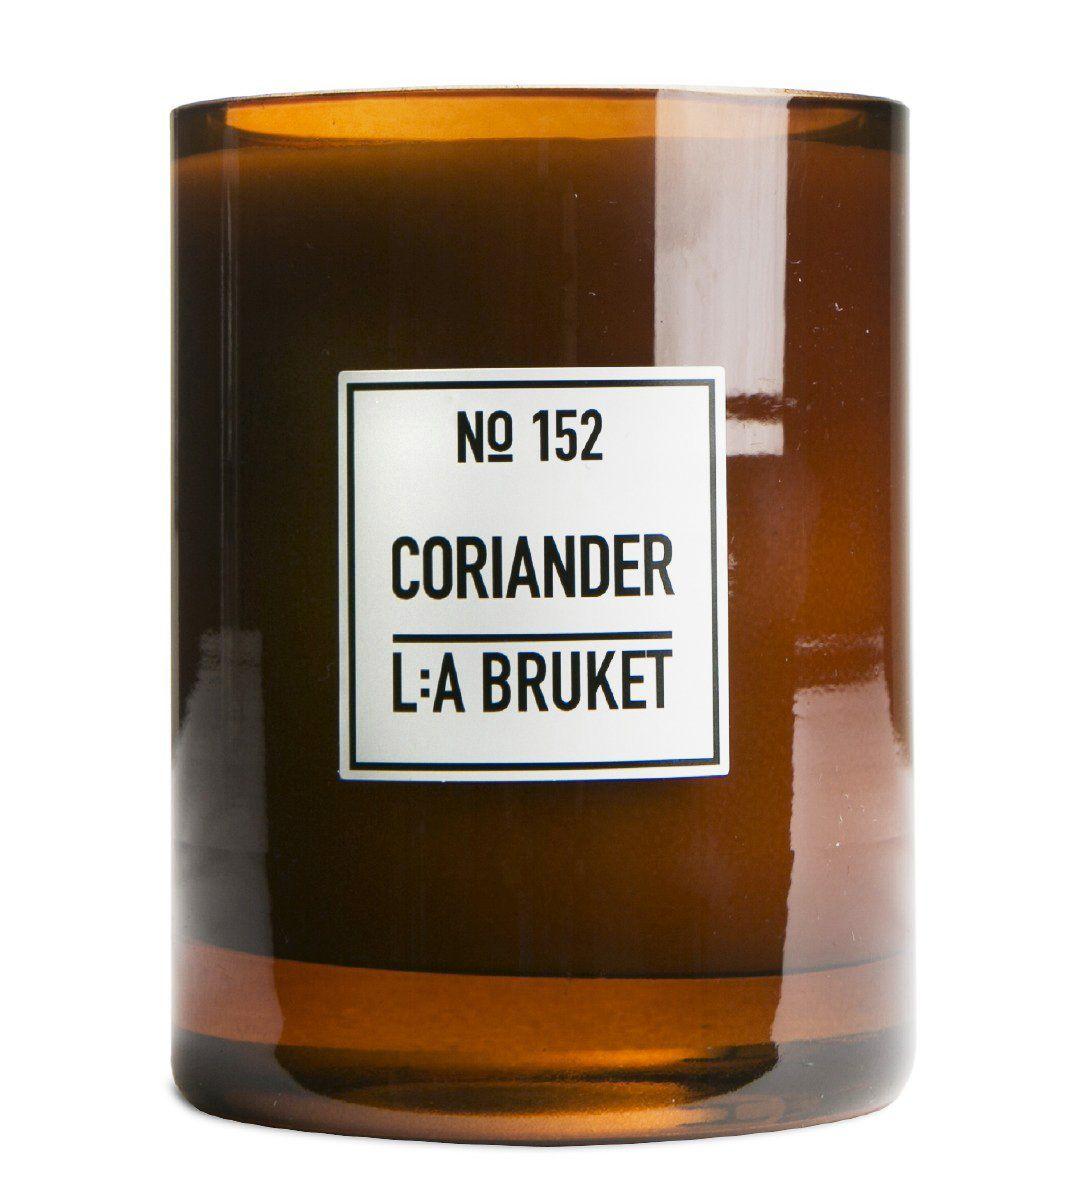 la:bruket coriander candle